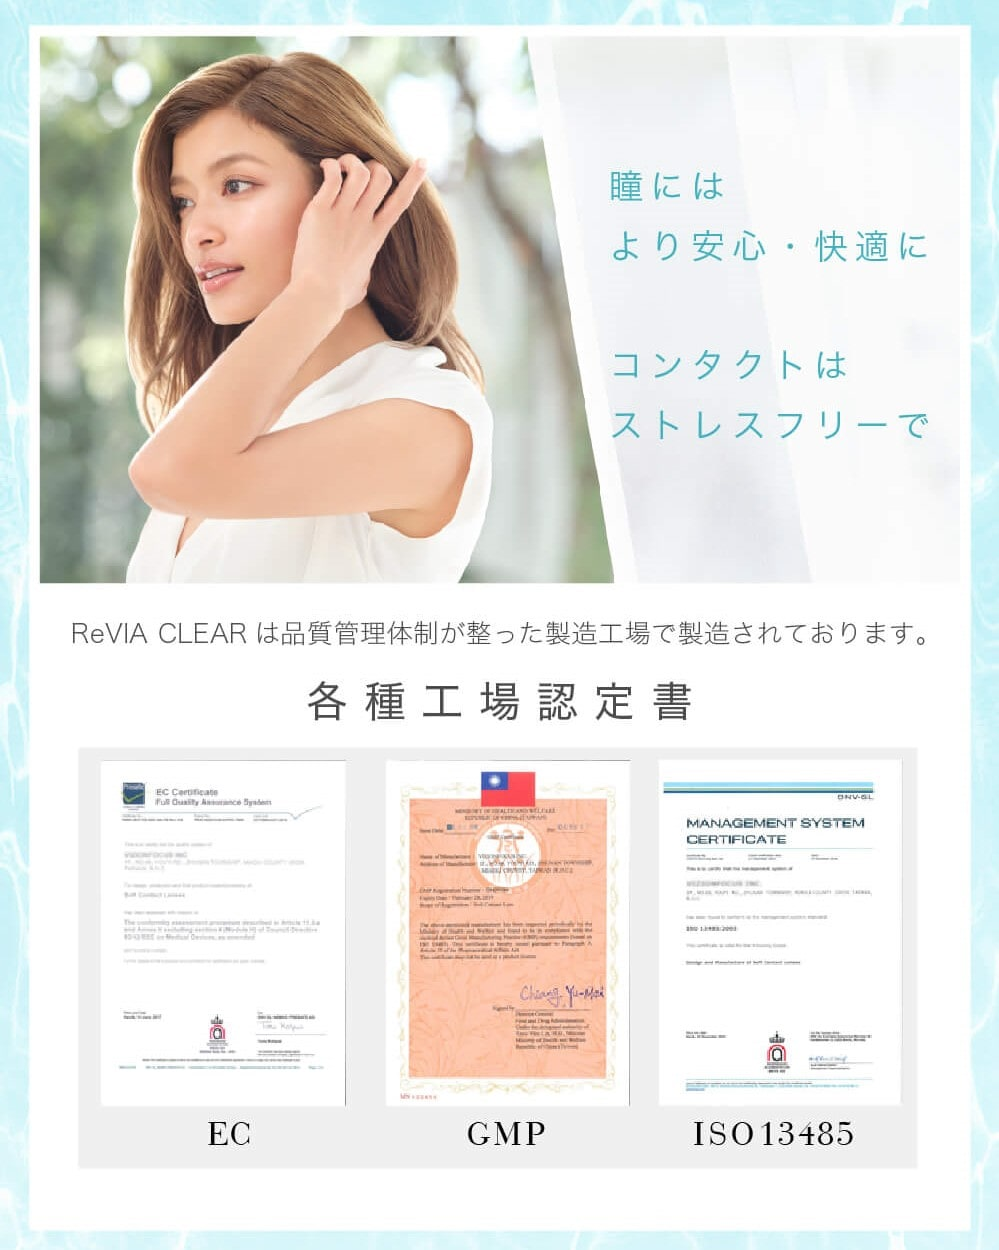 新ReVIA CLEAR 1day Premium 工場認定書